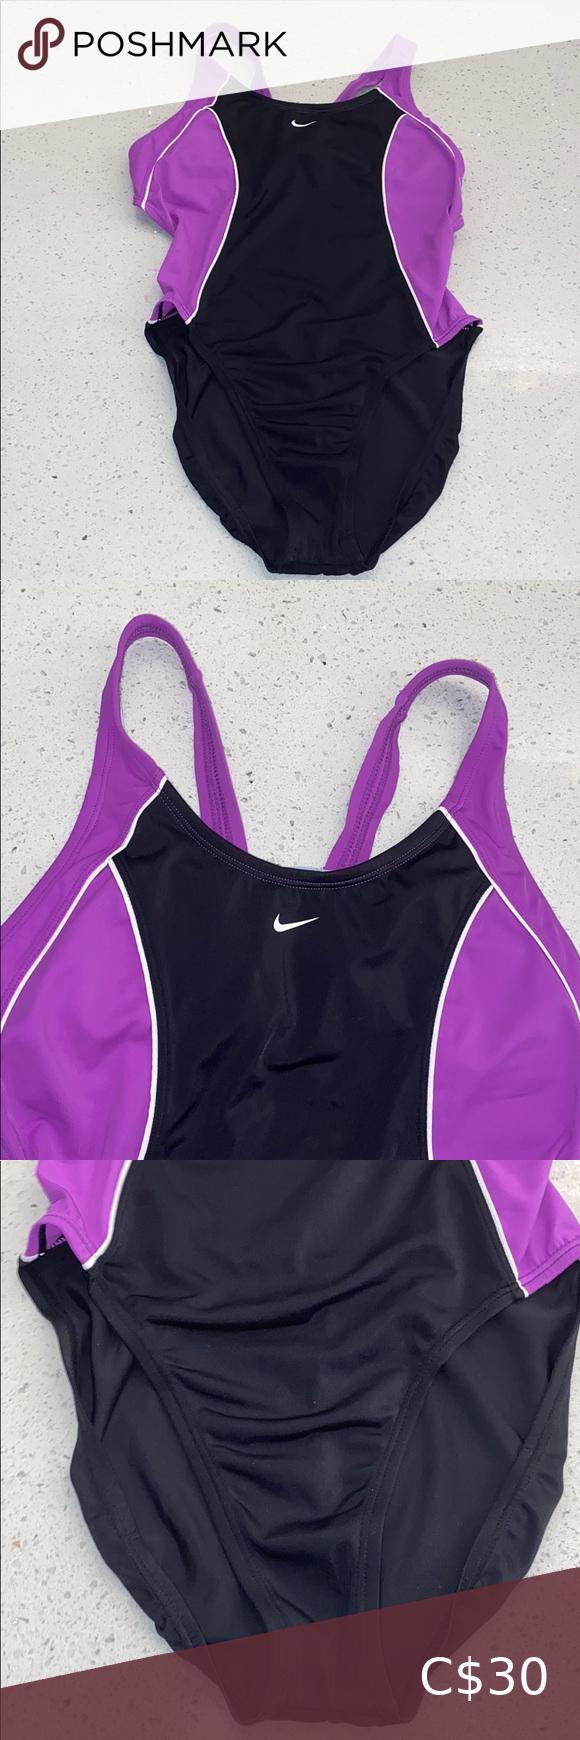 Nike One Piece Swimsuit – Swimsuit